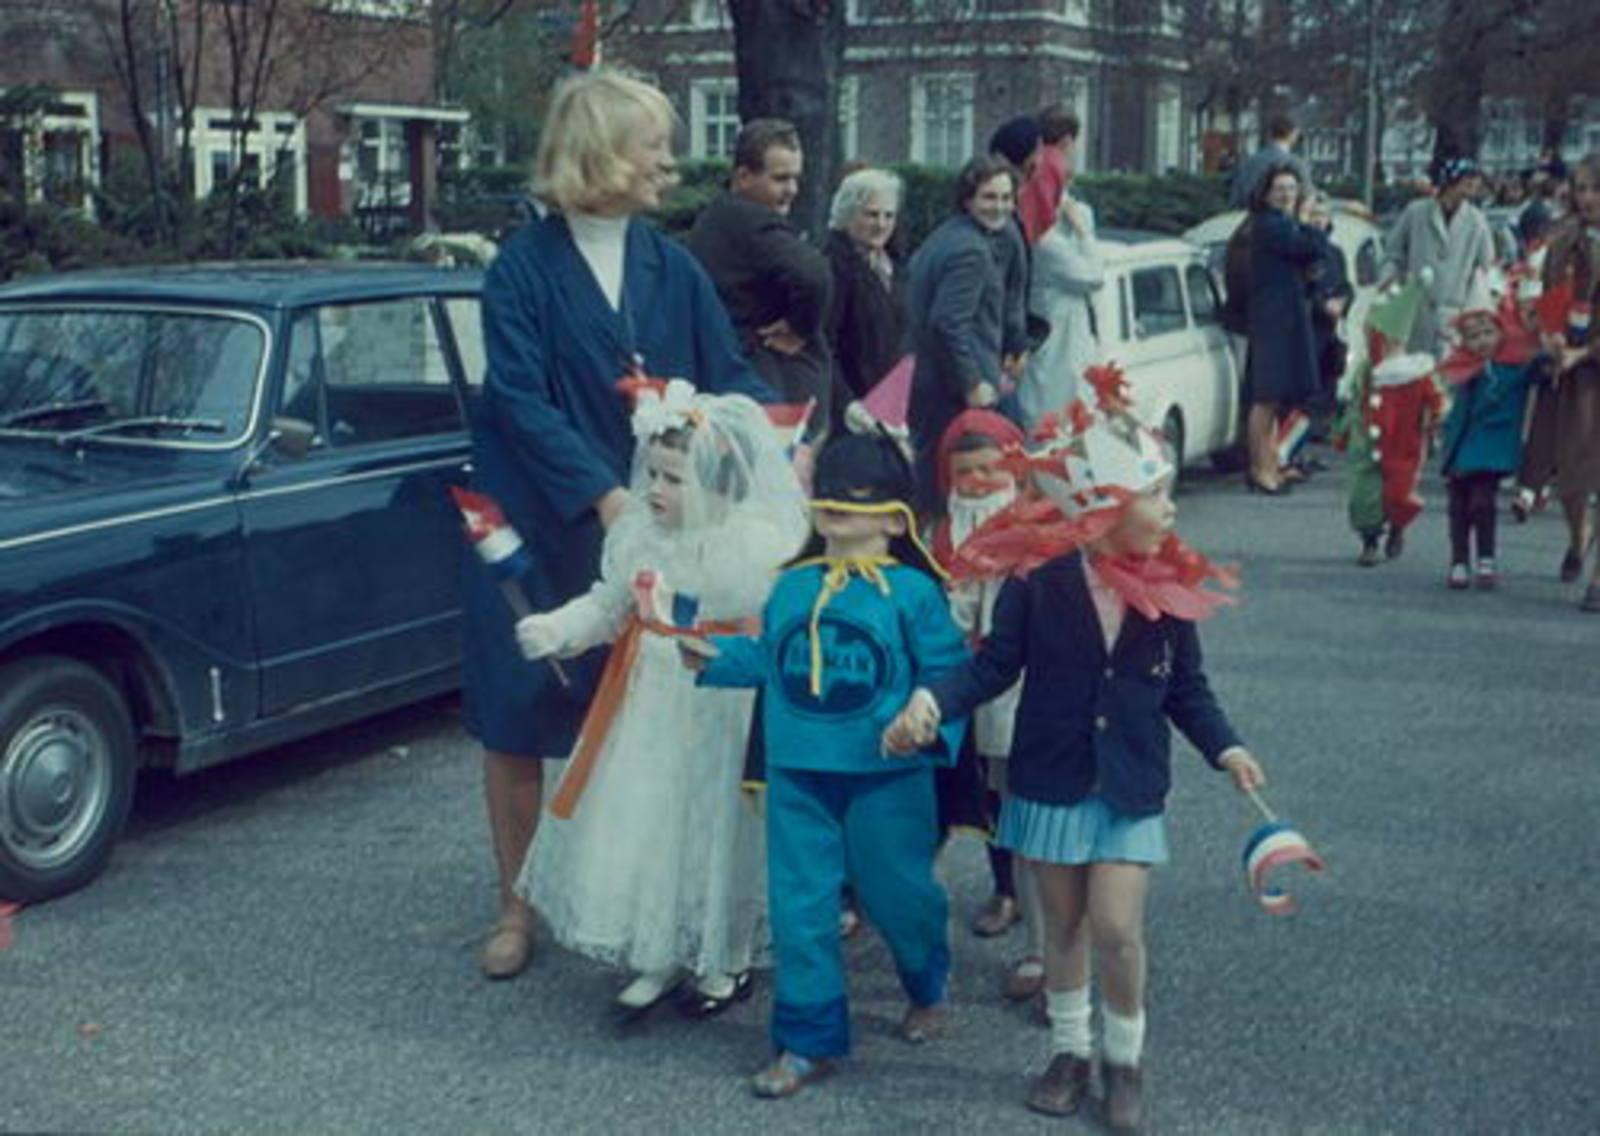 Hoofddorp Koninginnedag 1967± bij Hoofdweg 677